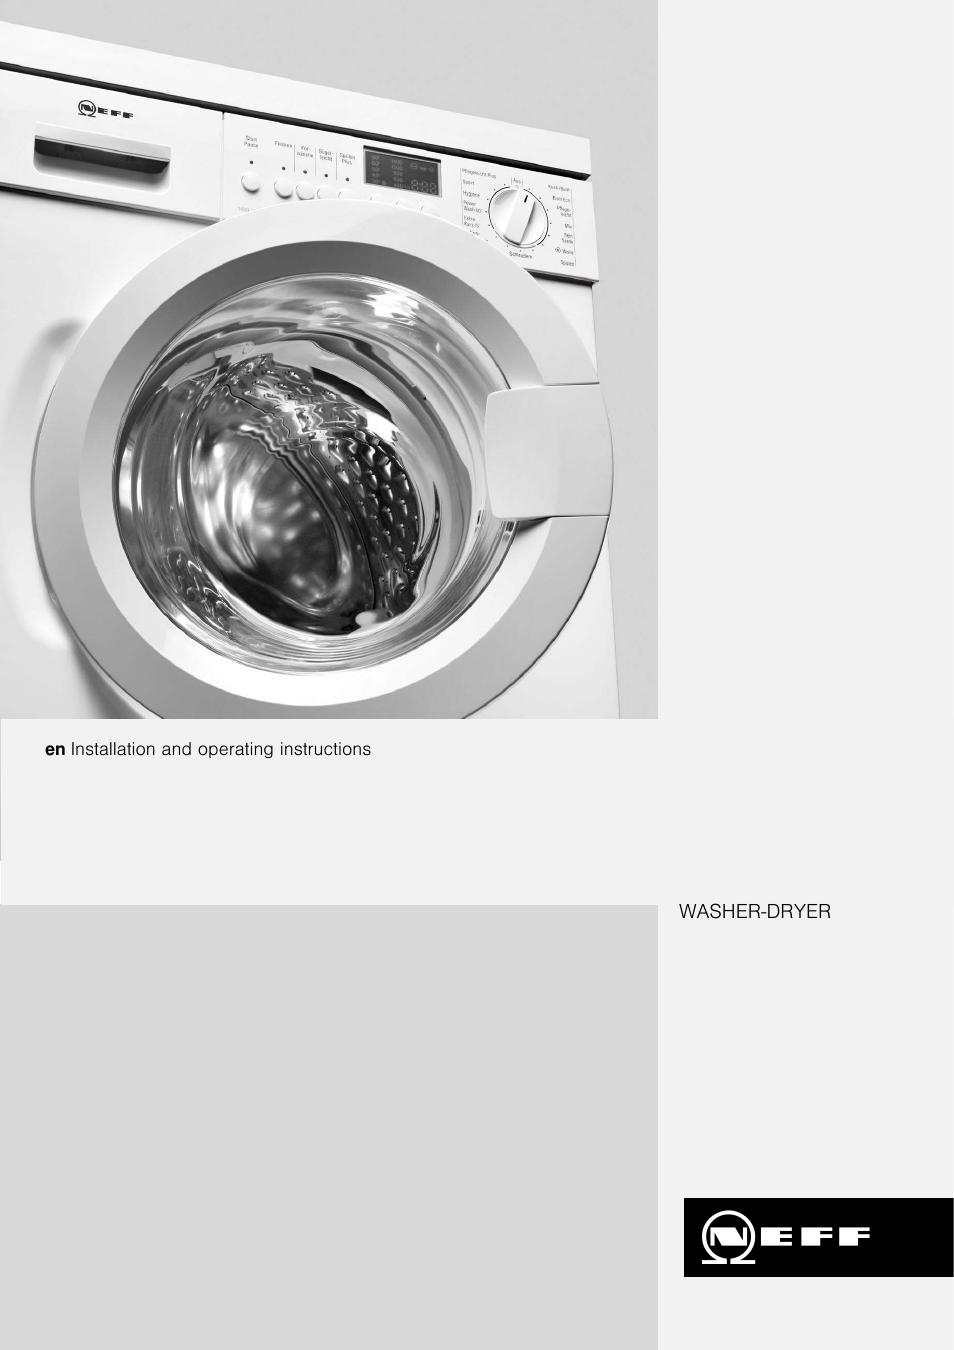 neff v6320x0gb user manual 32 pages rh manualsdir com neff washing machine support neff washing machine w5420x0gb manual